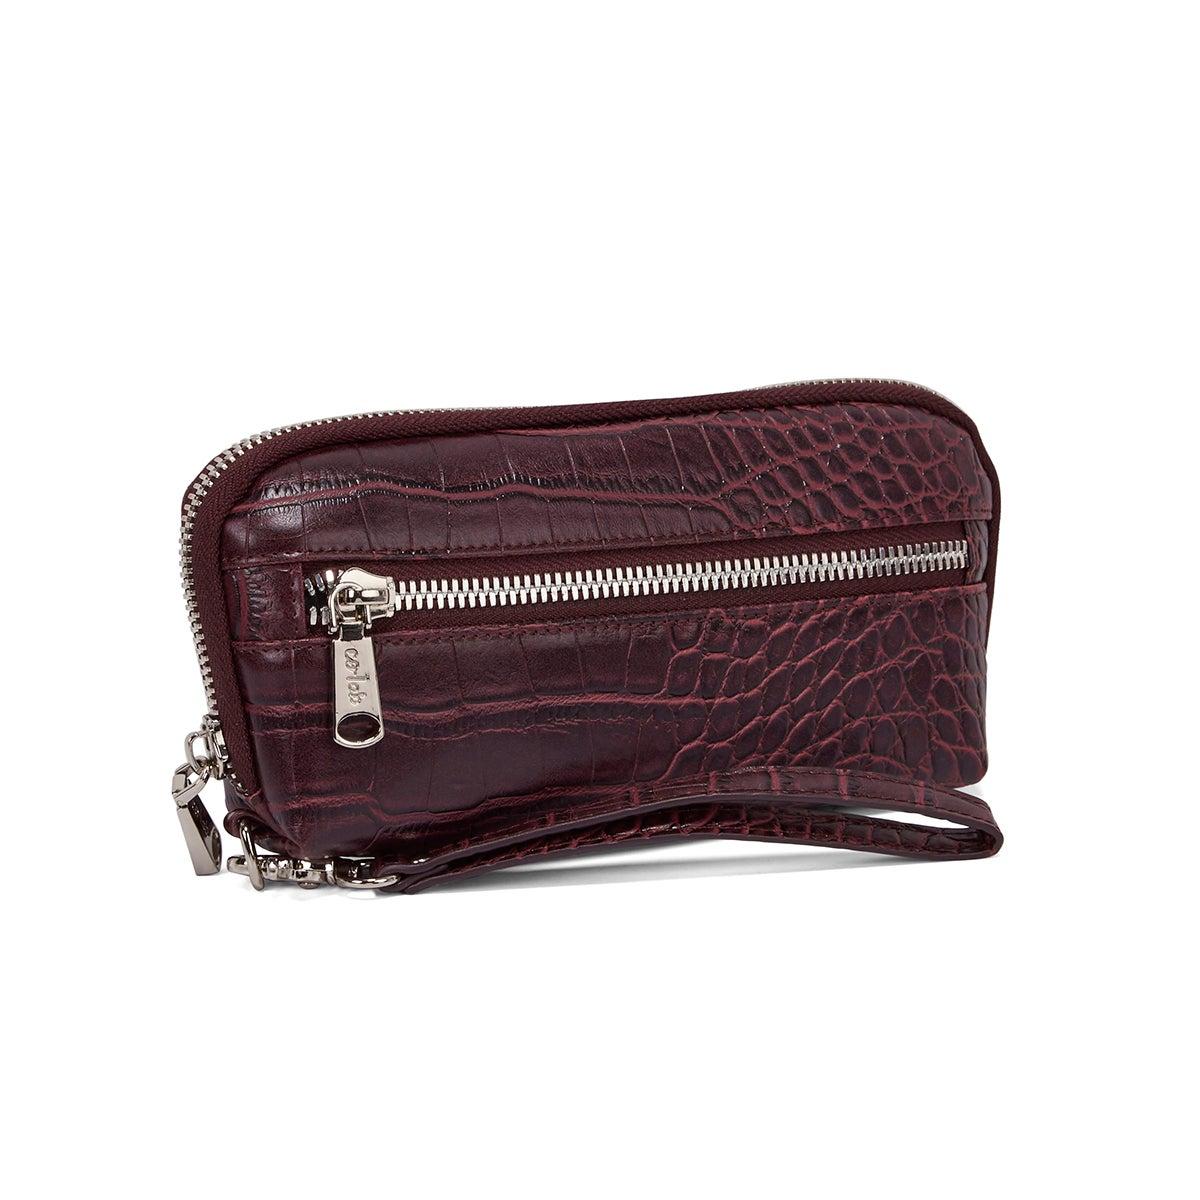 Lds wine croco print wristlet wallet